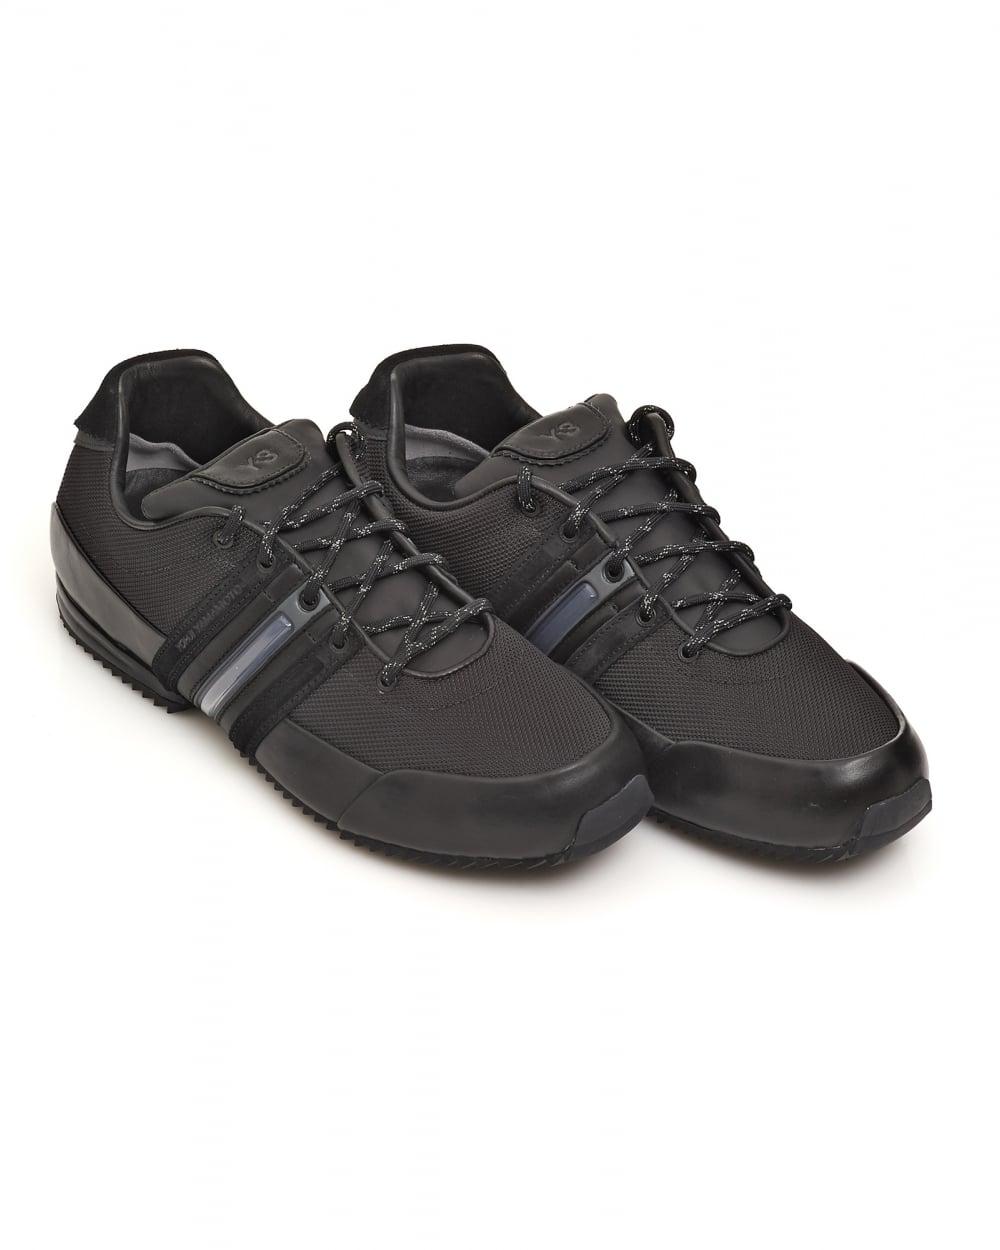 626eeb35c5b643 Y-3 Mens Core All Black Sprint Mesh Leather Trainers